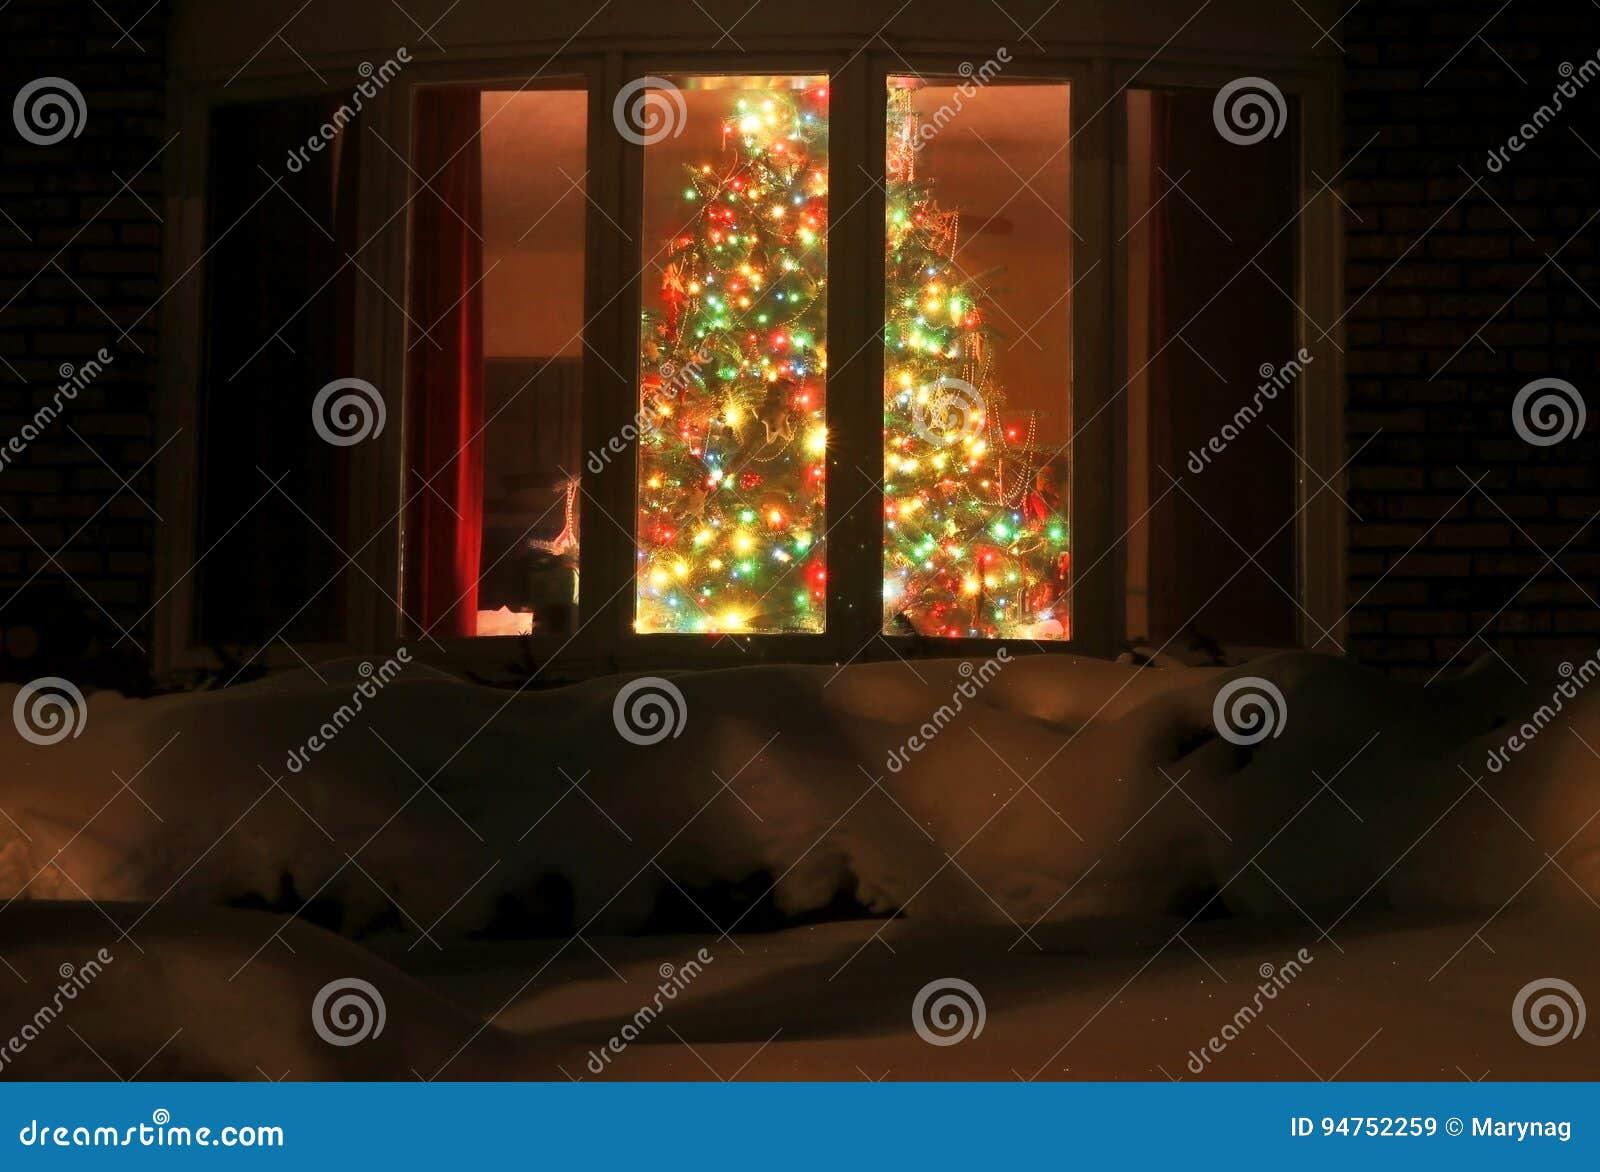 Welcome Home Christmas Tree Stock Image Image Of Snow